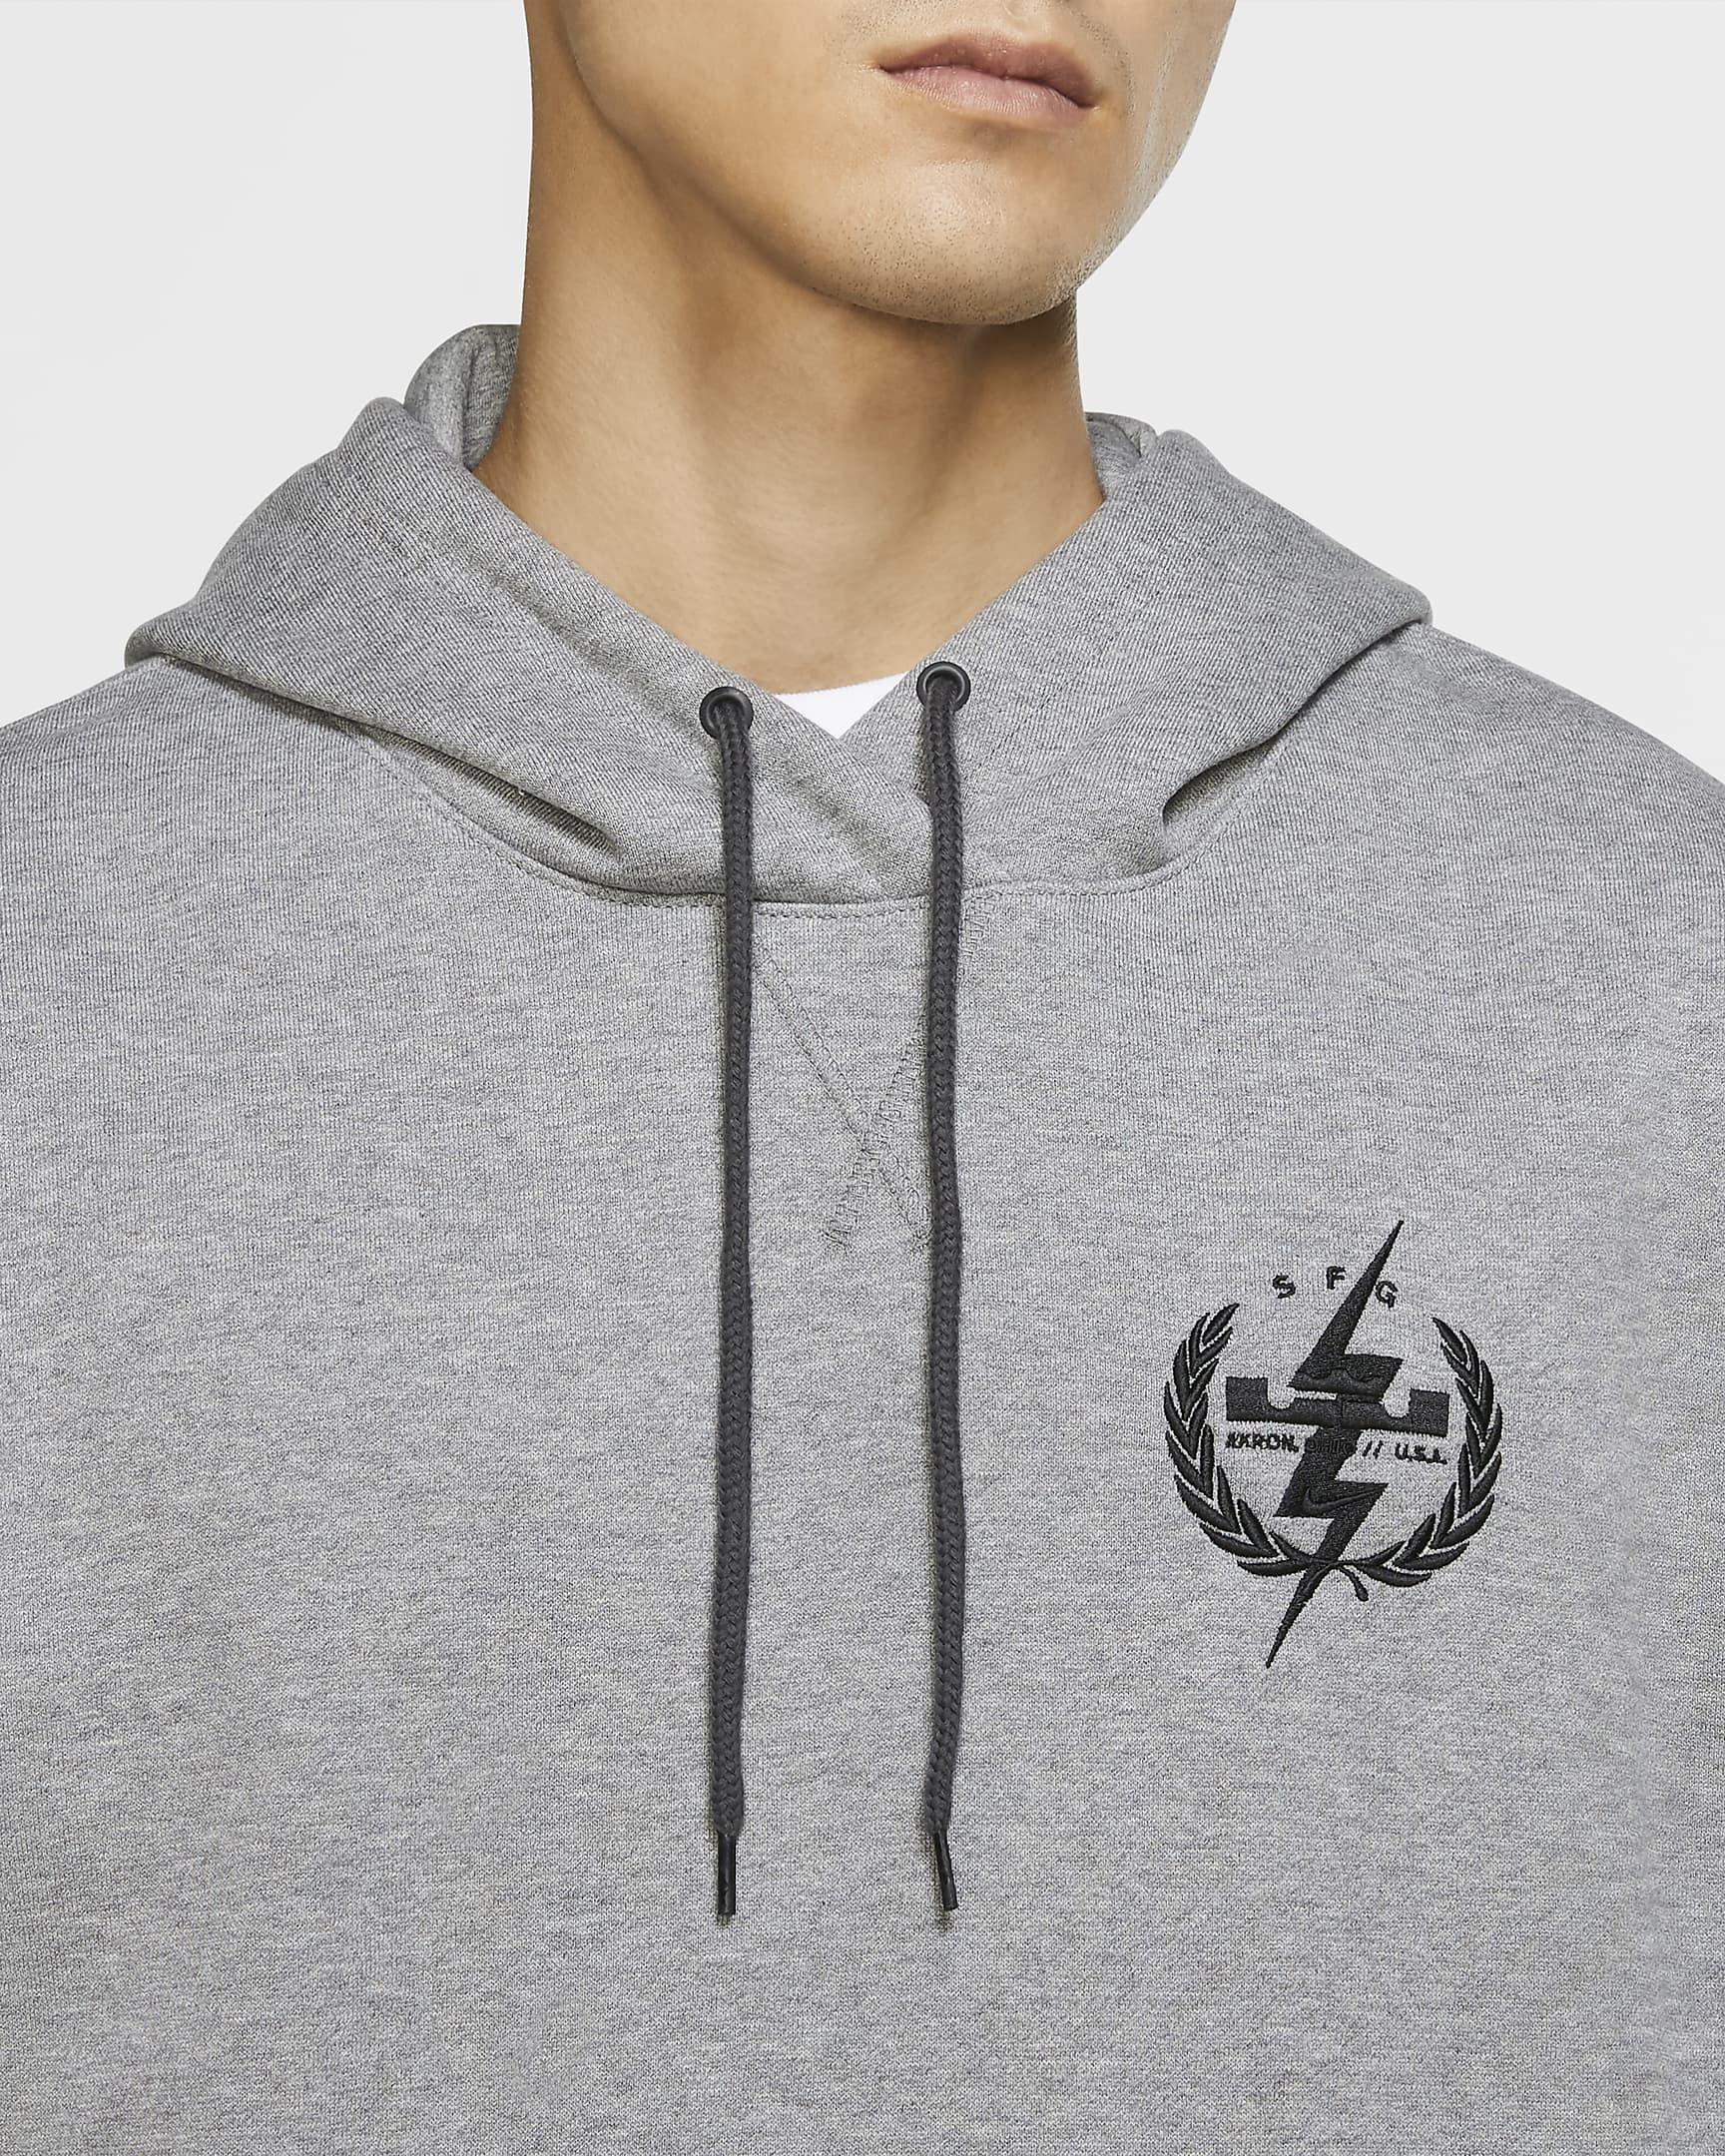 lebron-mens-pullover-hoodie-PmPN2T-3